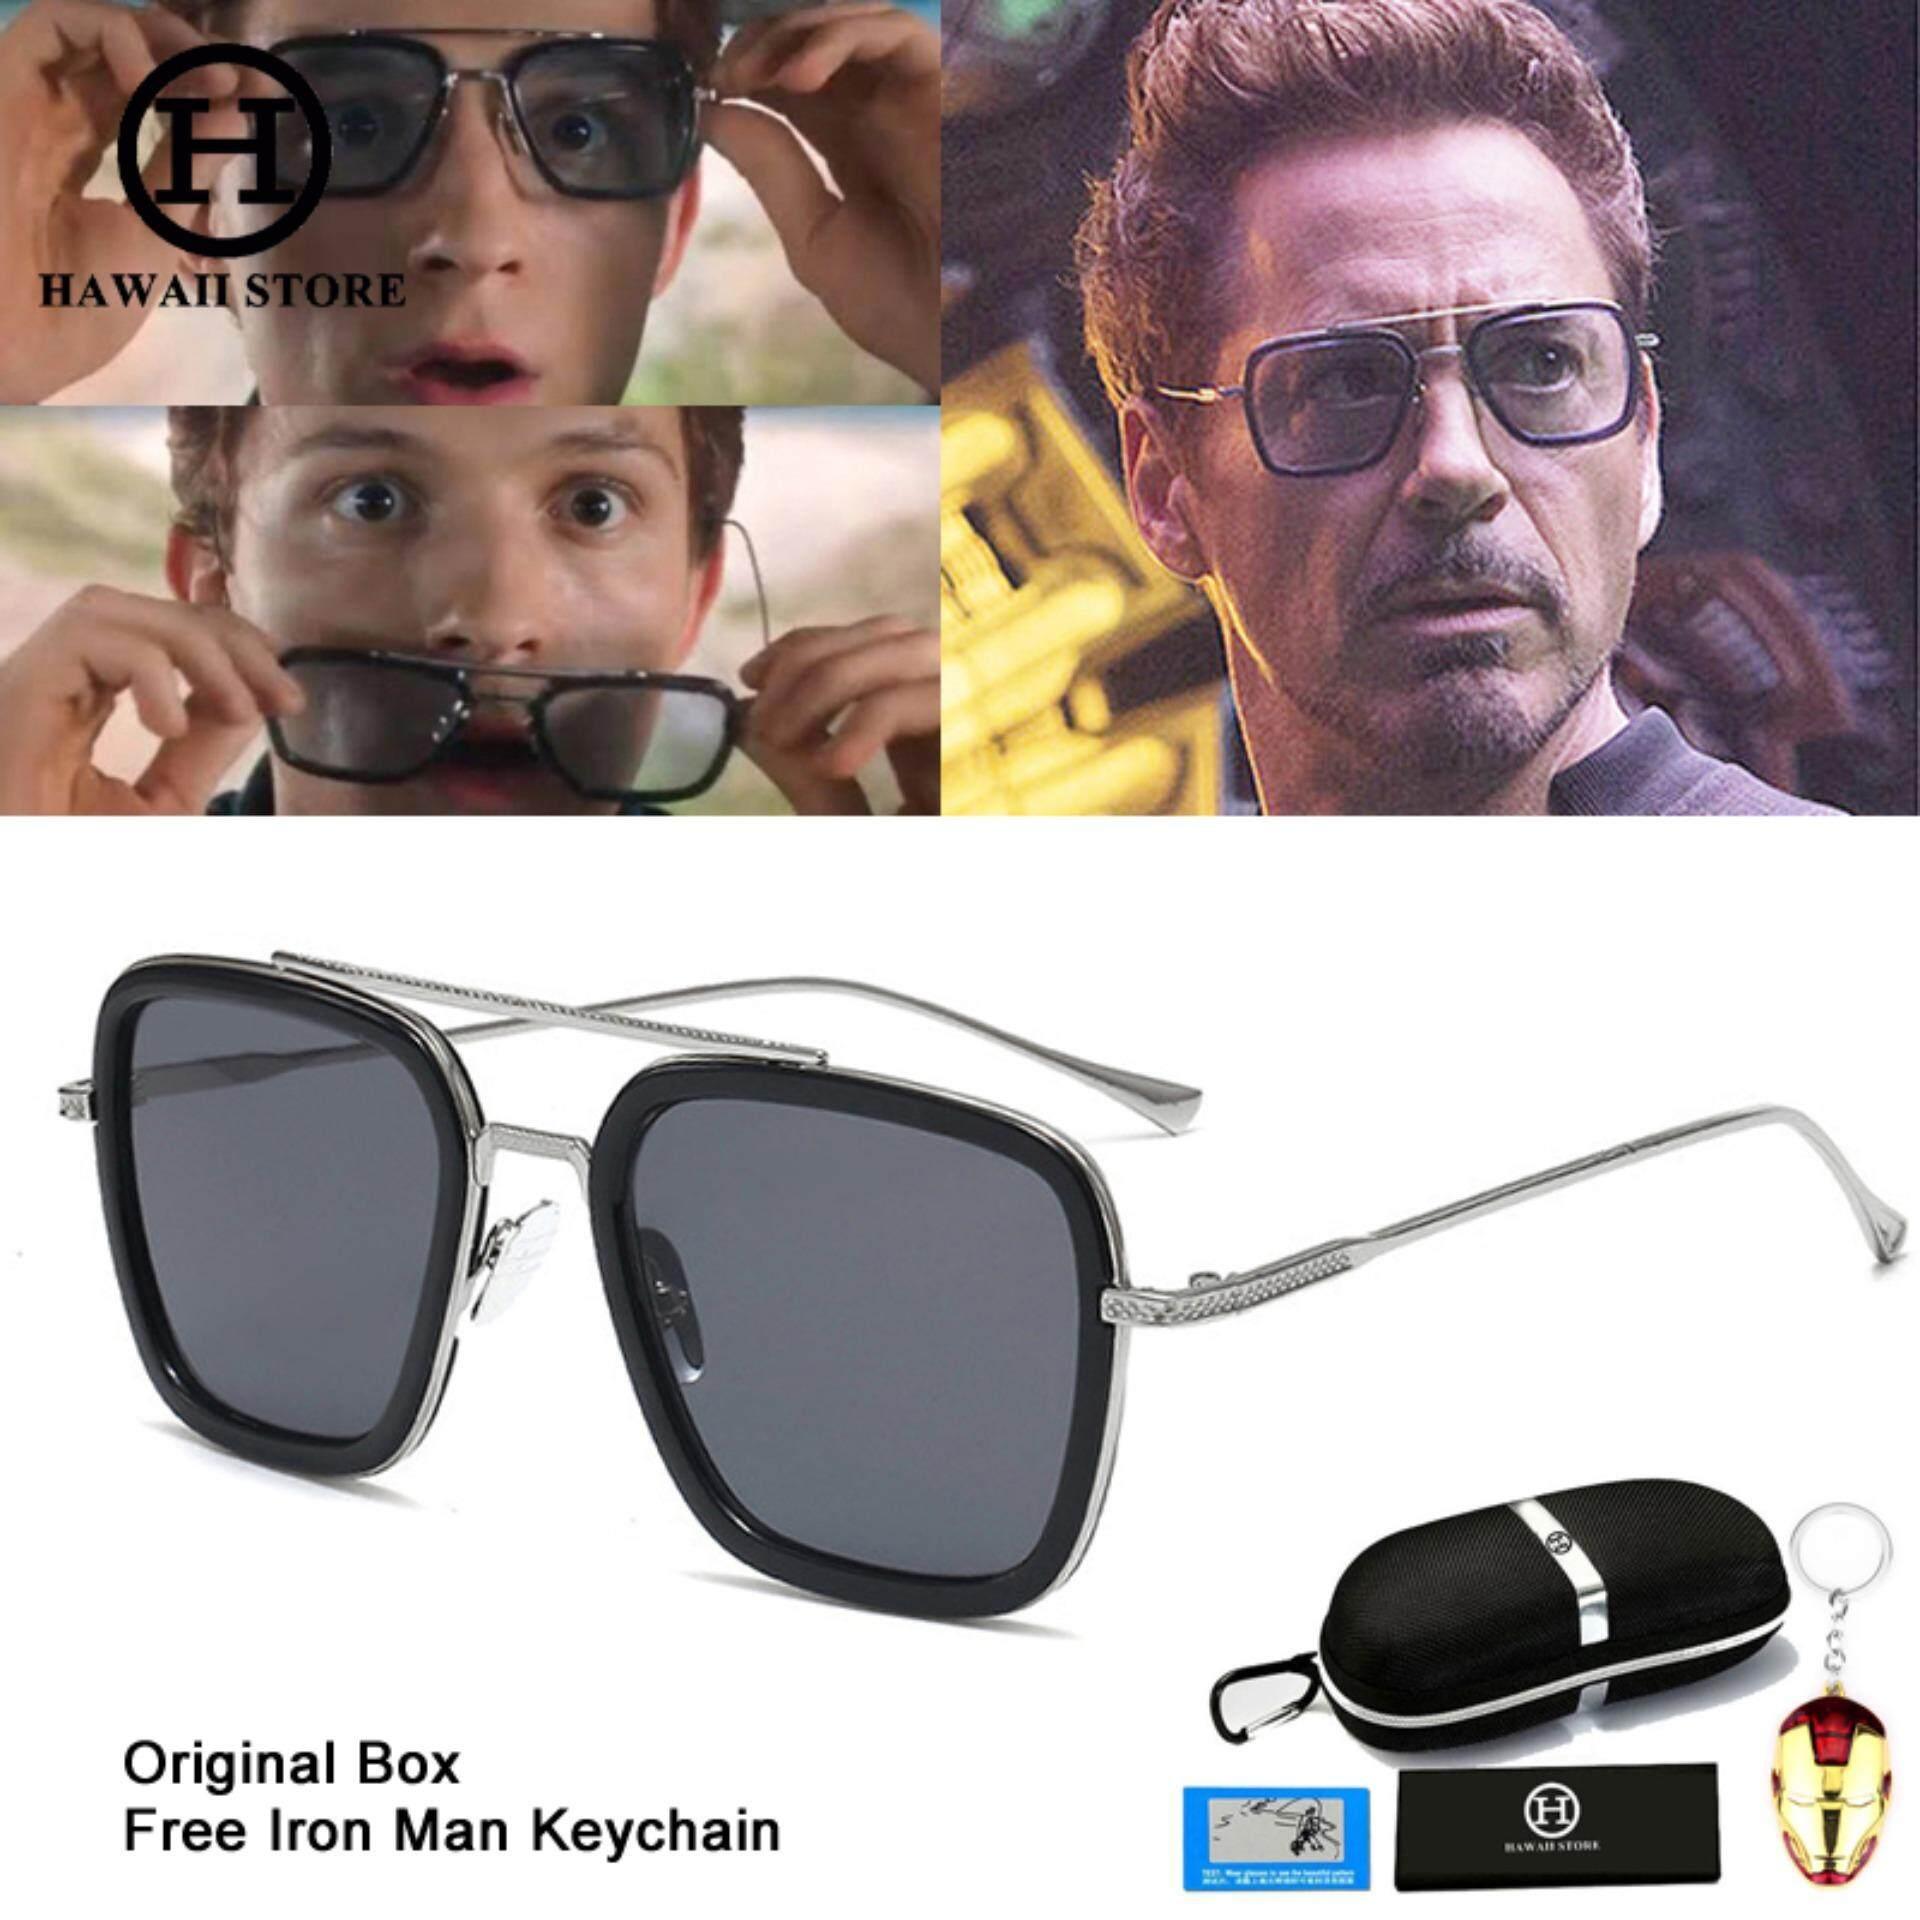 7ceda6629e3393 Hawaii Collection Fashion Avengers Tony Stark Flight 006 Style Sunglasses  Men Square Aviation Brand Design Sun